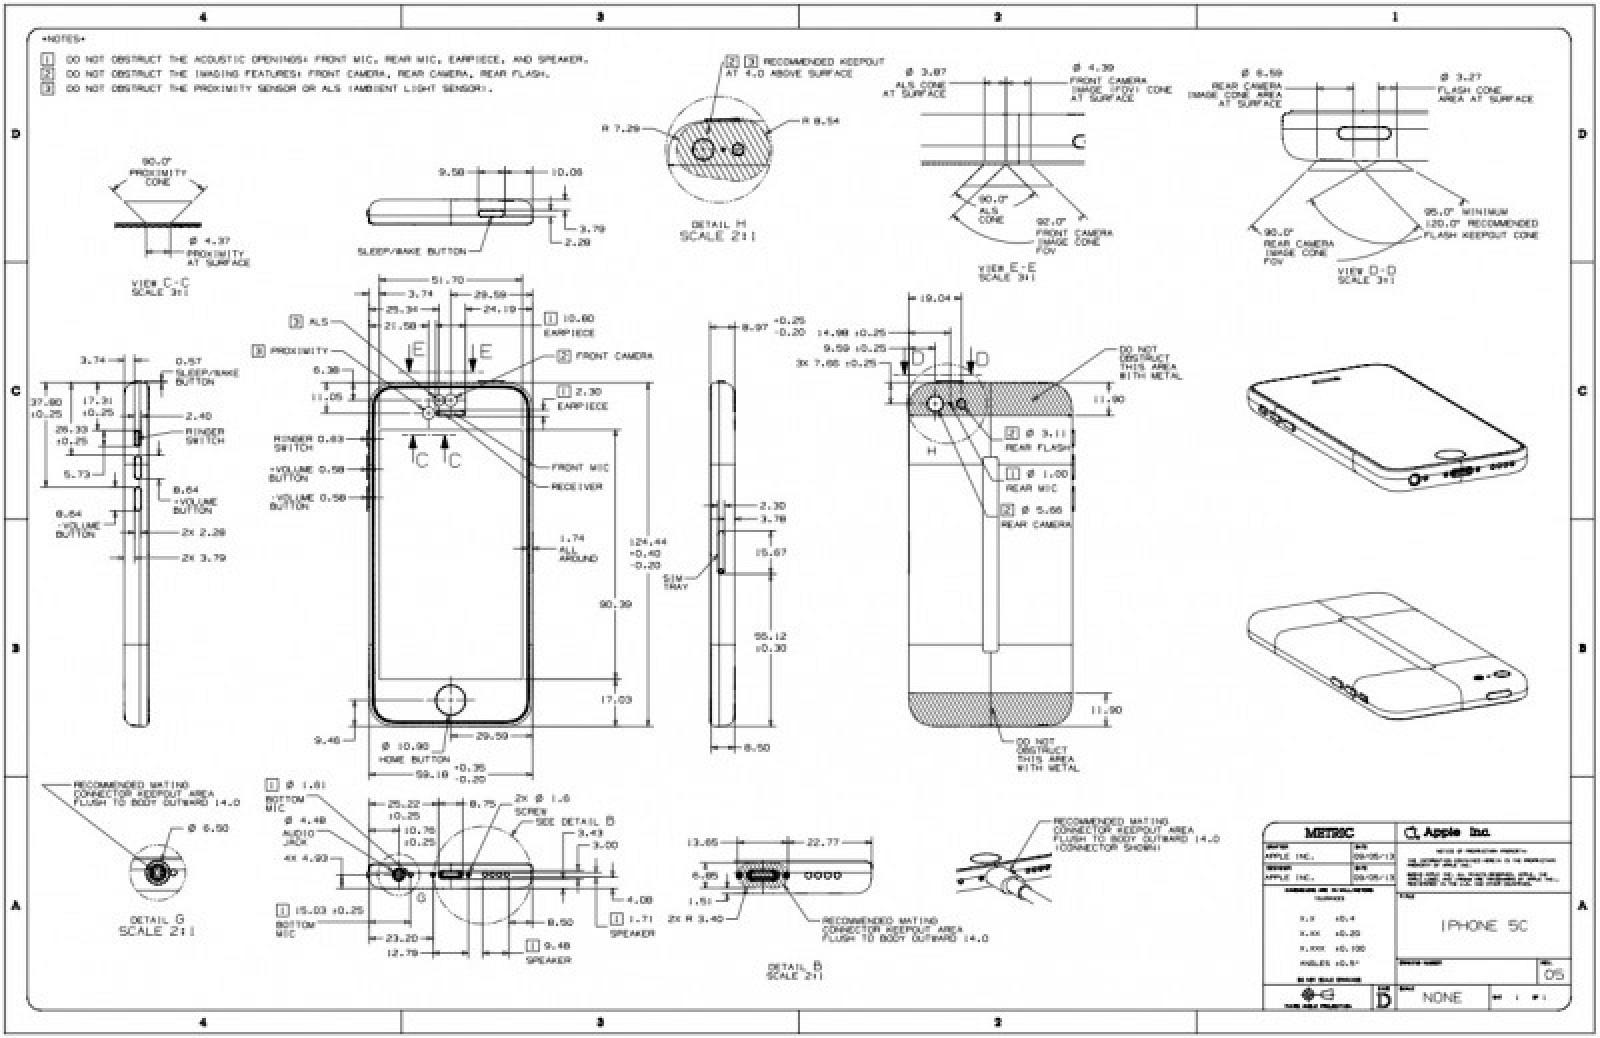 1996 nissan pathfinder service repair shop manual set factory oem book 96 service manual product bulletins manual